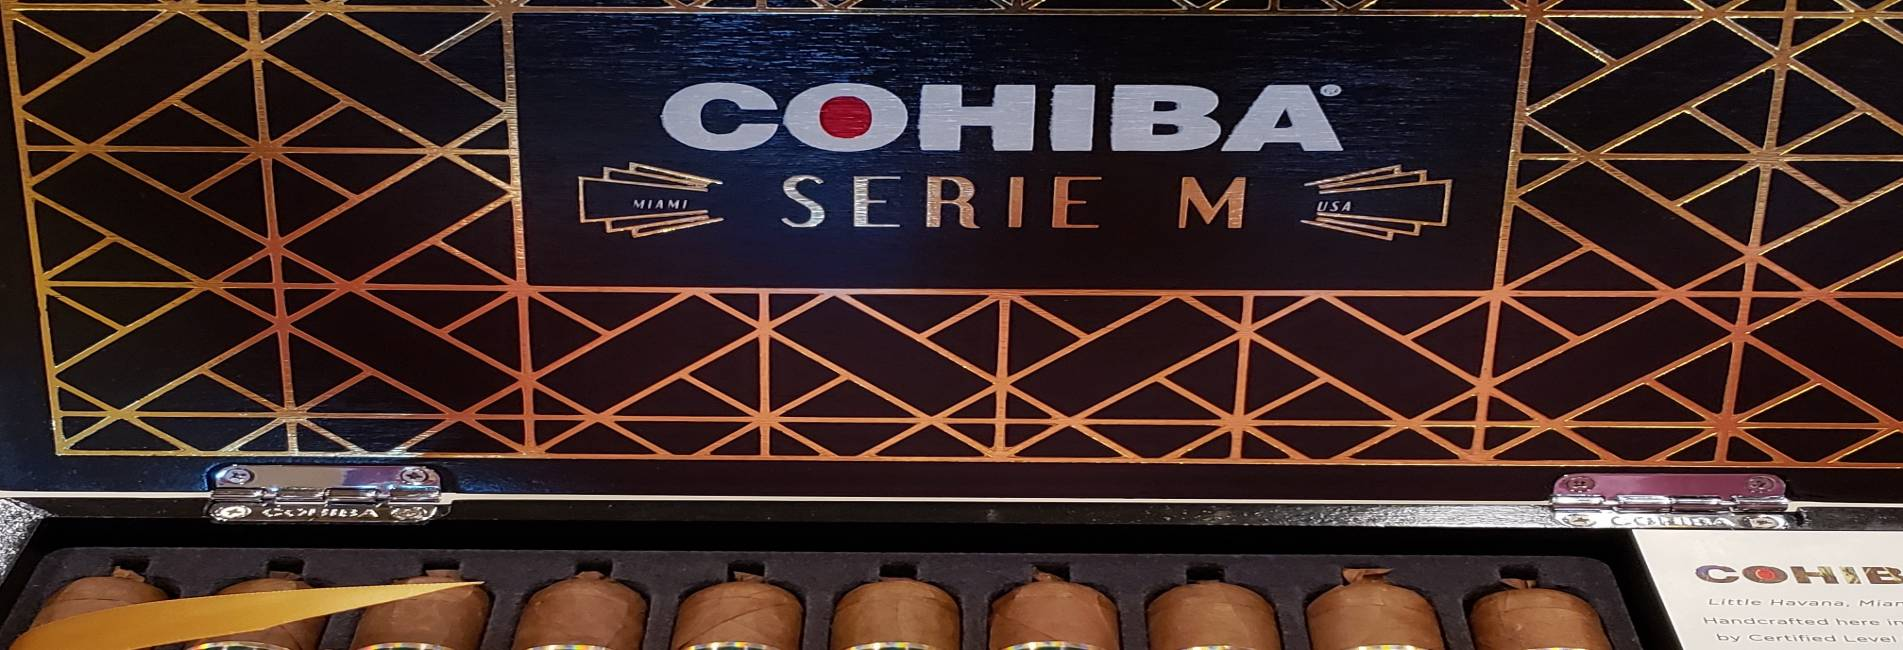 Cohiba M